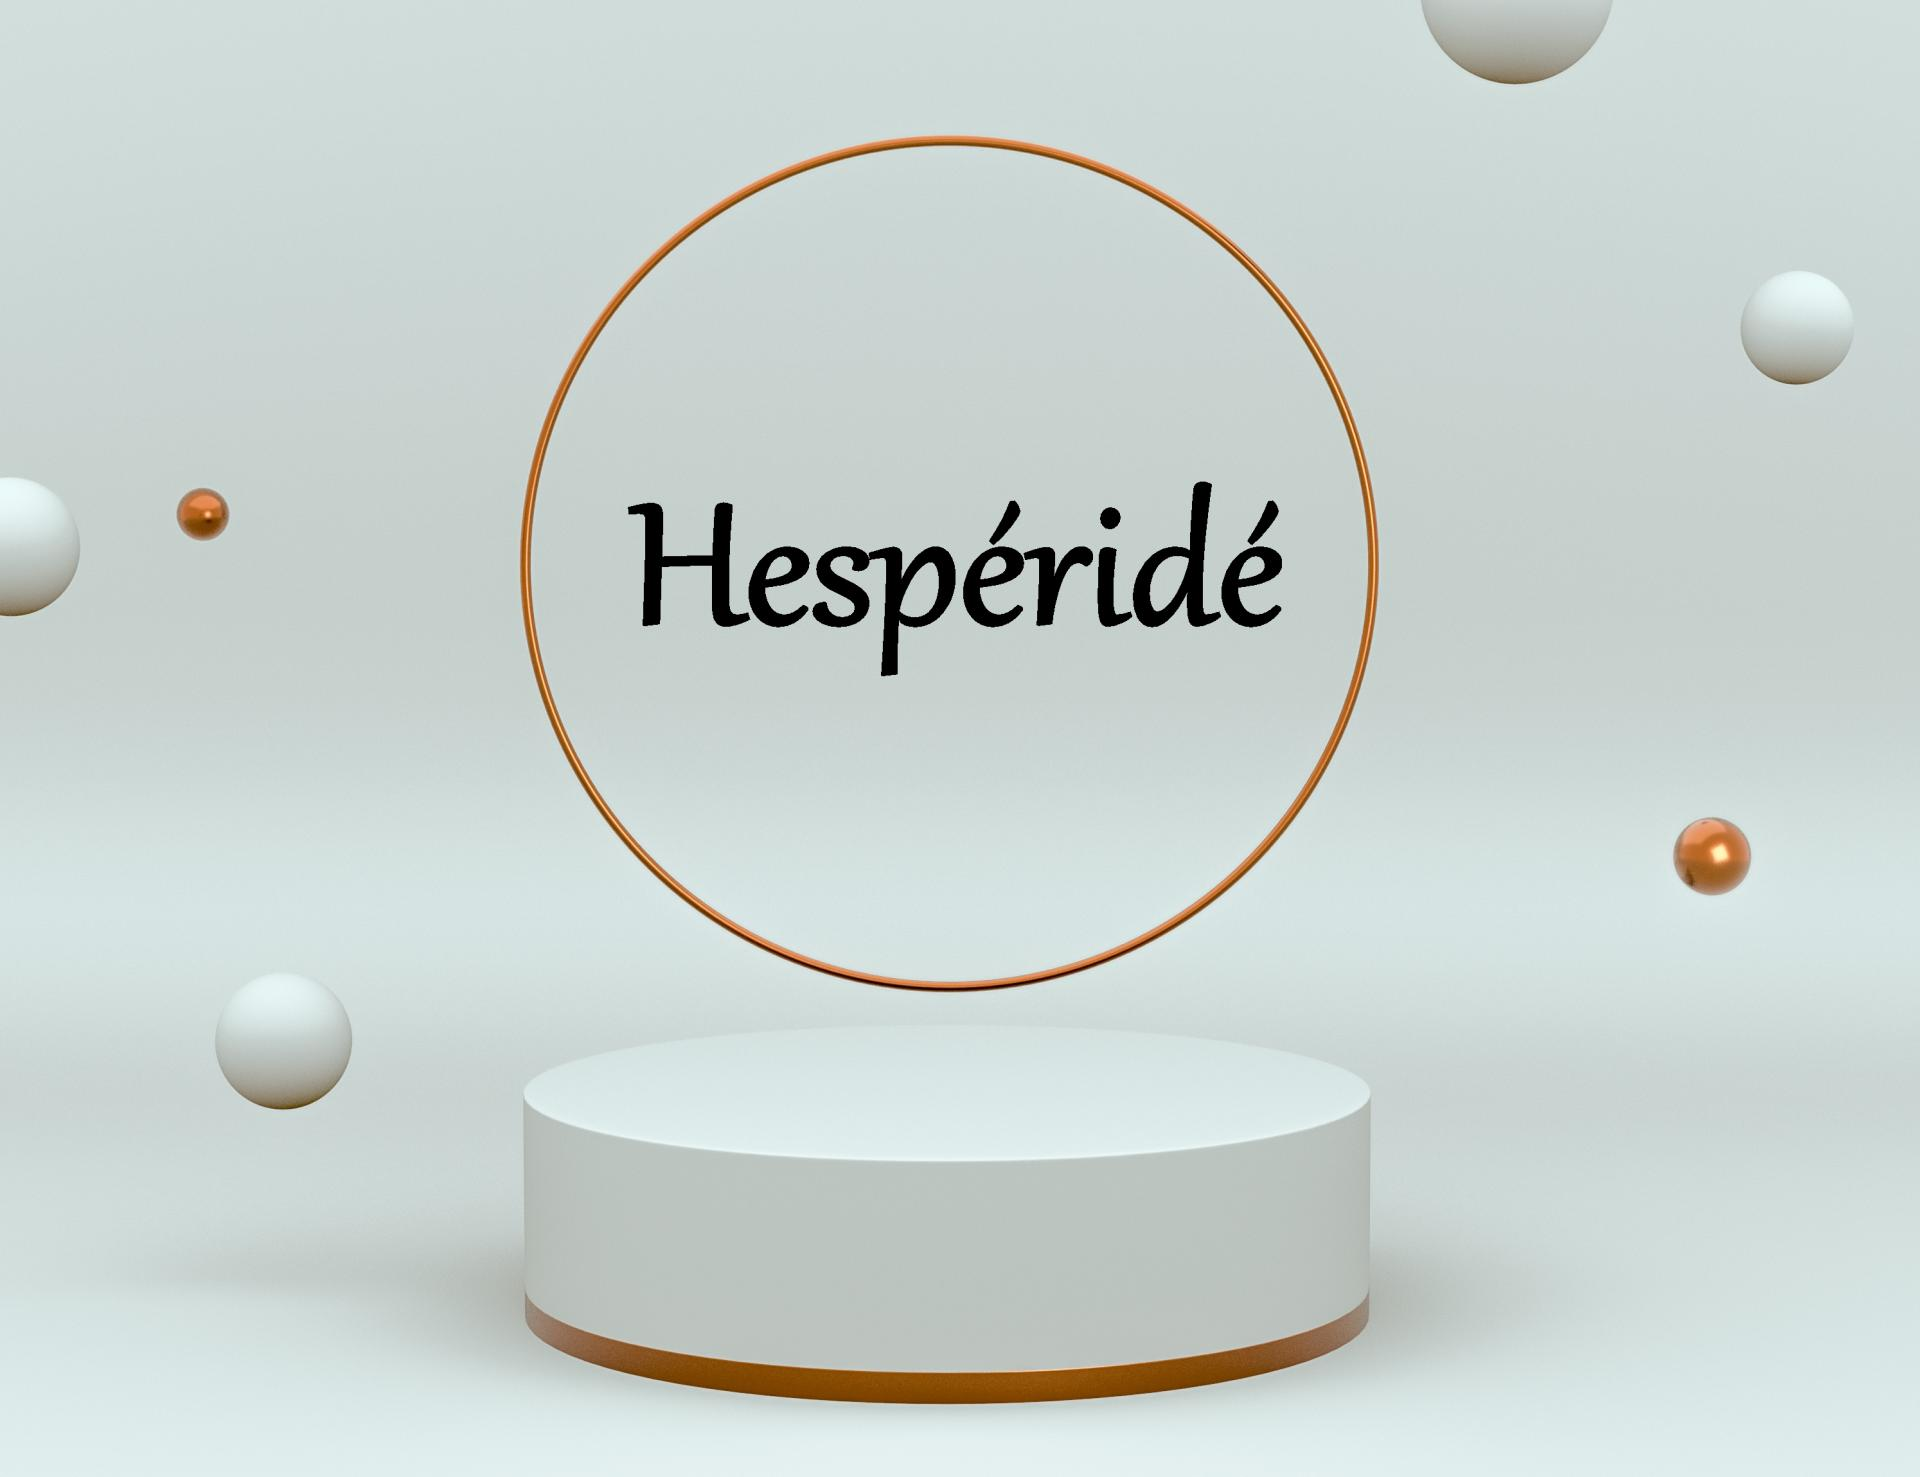 Hesperide 5